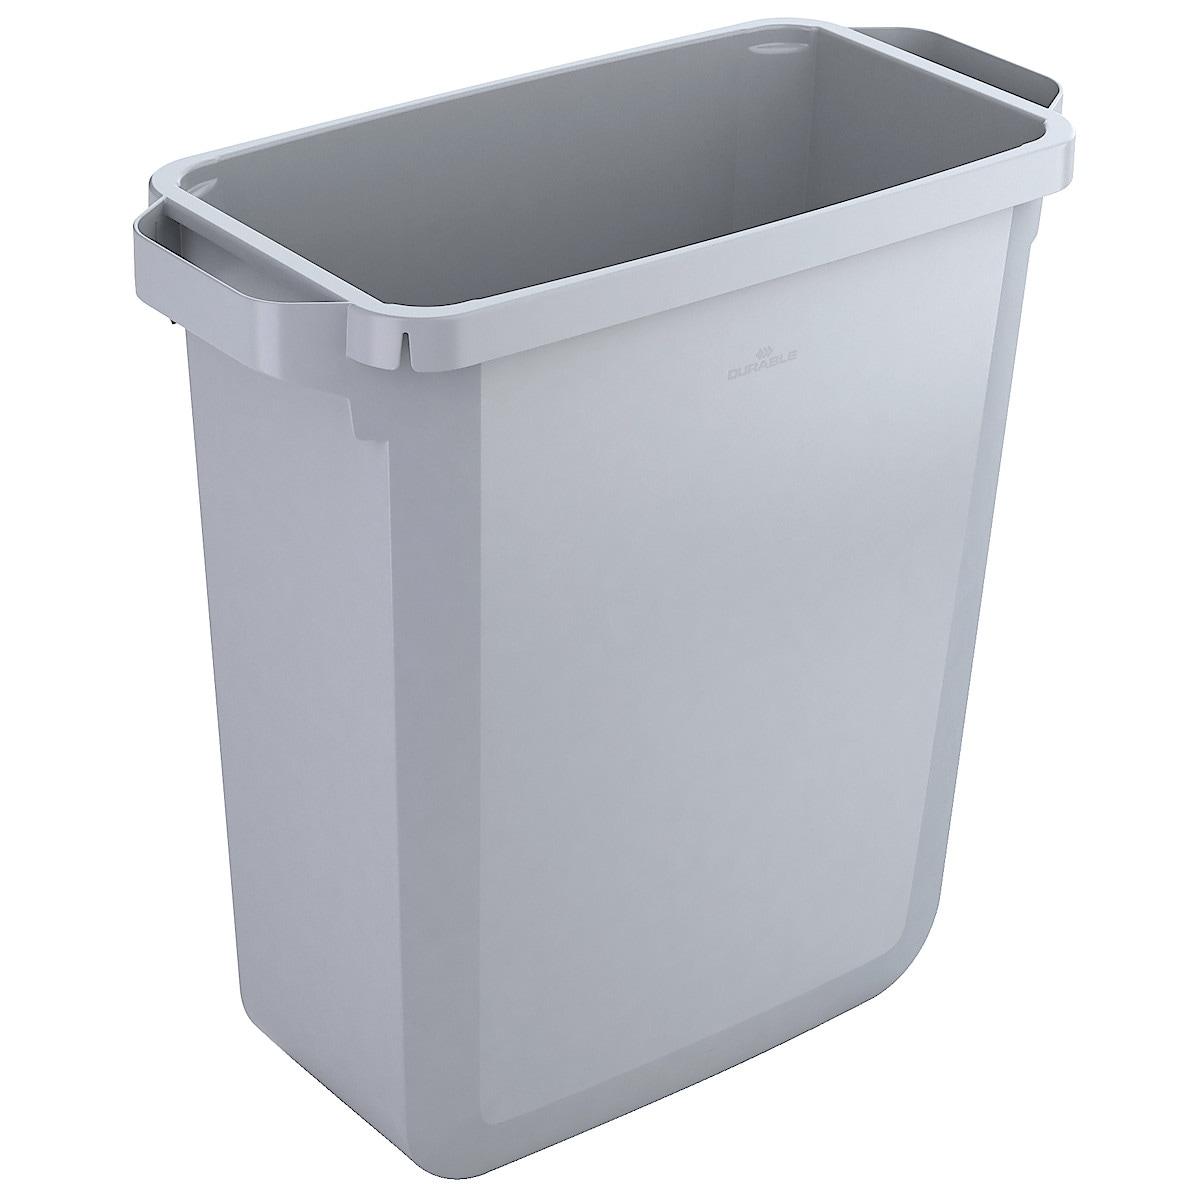 Soptunna Durabin 60 l, grå